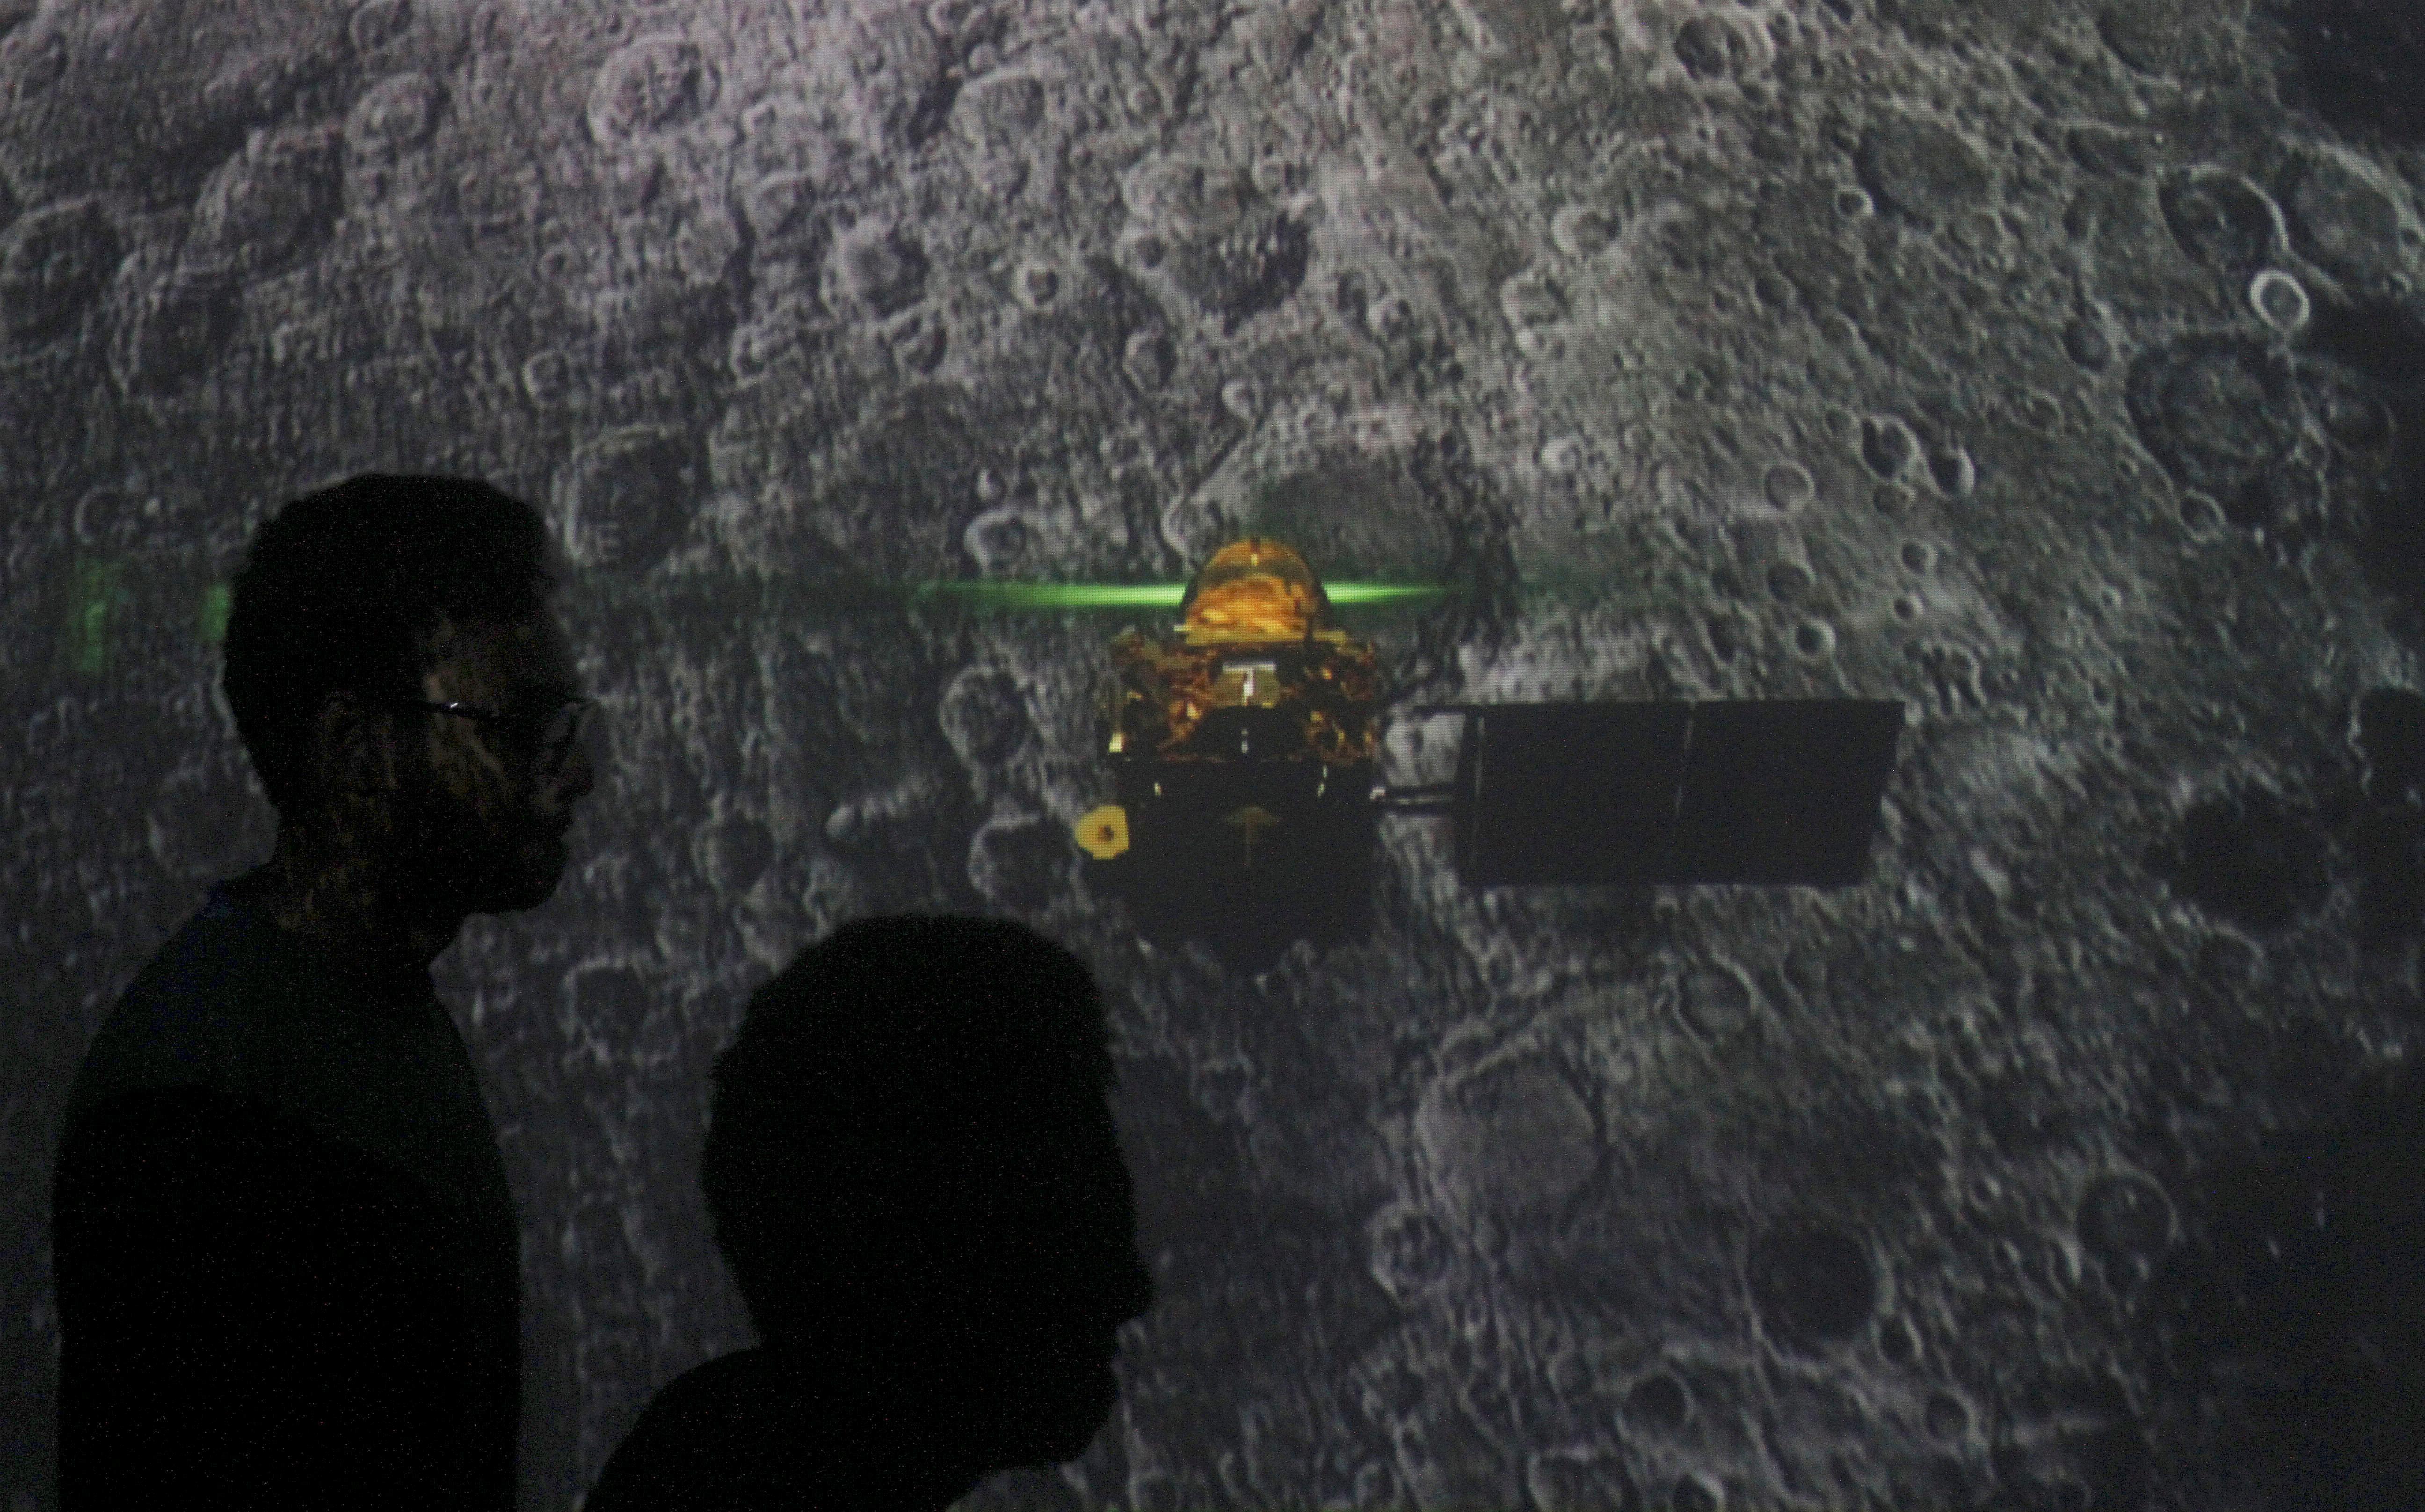 India's moon mission locates landing craft, no communication yet